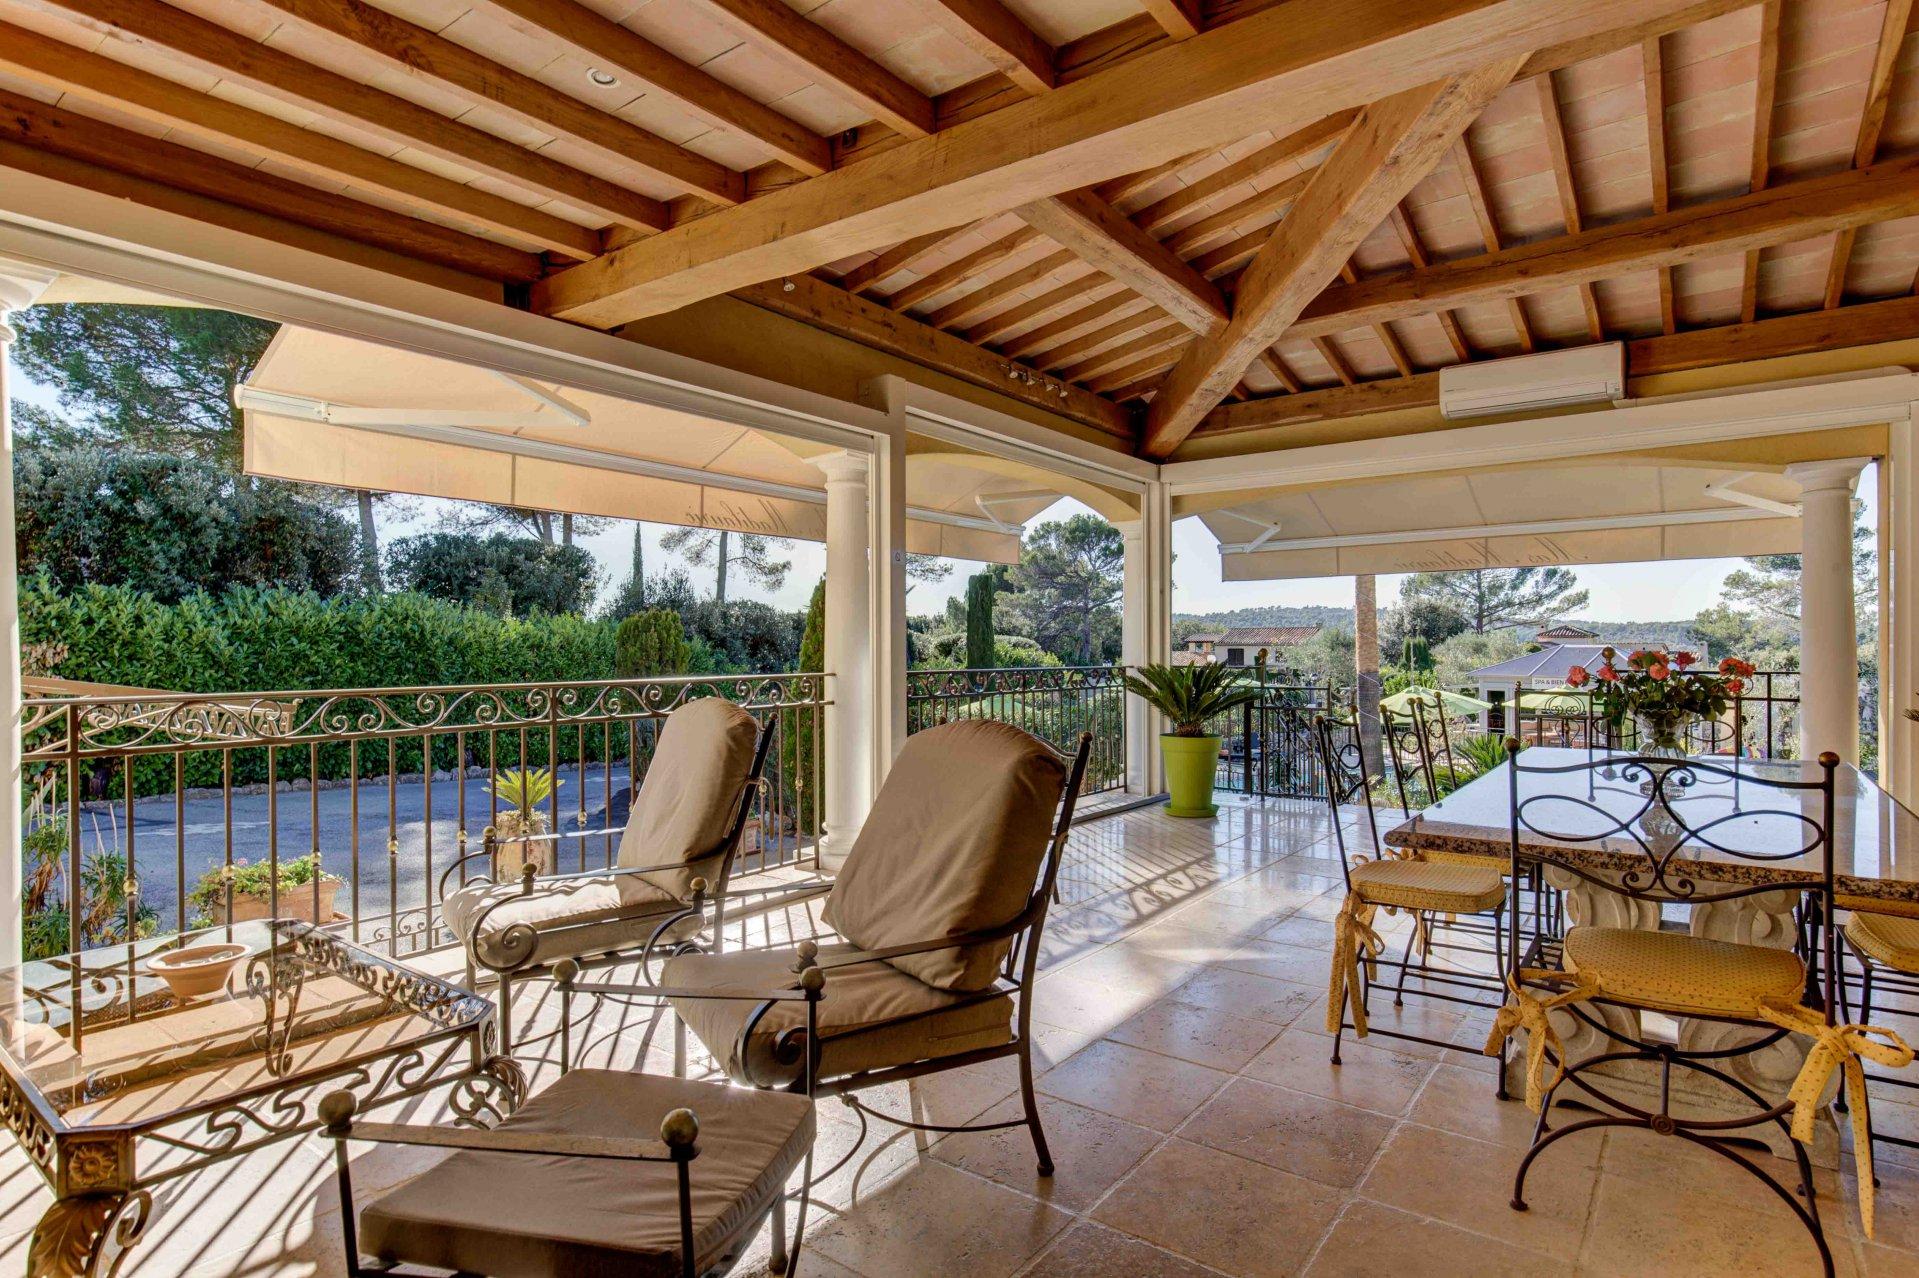 GRASSE ST JACQUES ultra-residential, quiet villa